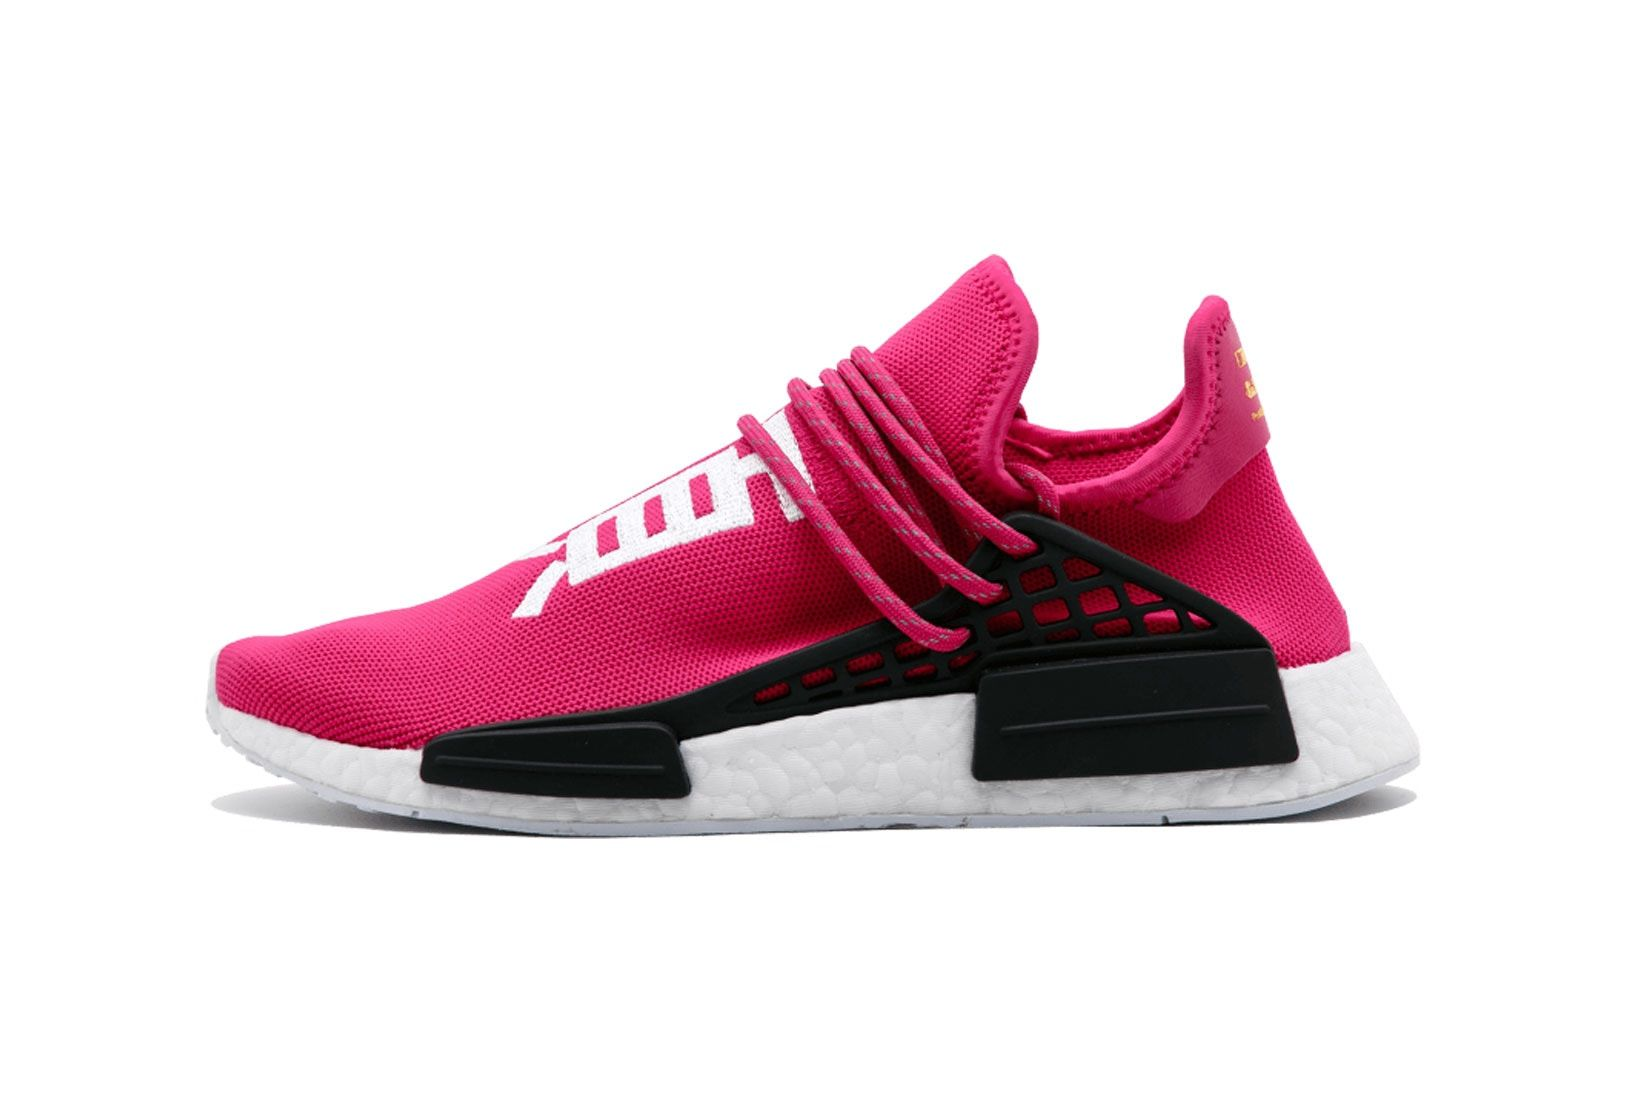 Human race shoes, Tennis shoes outfit